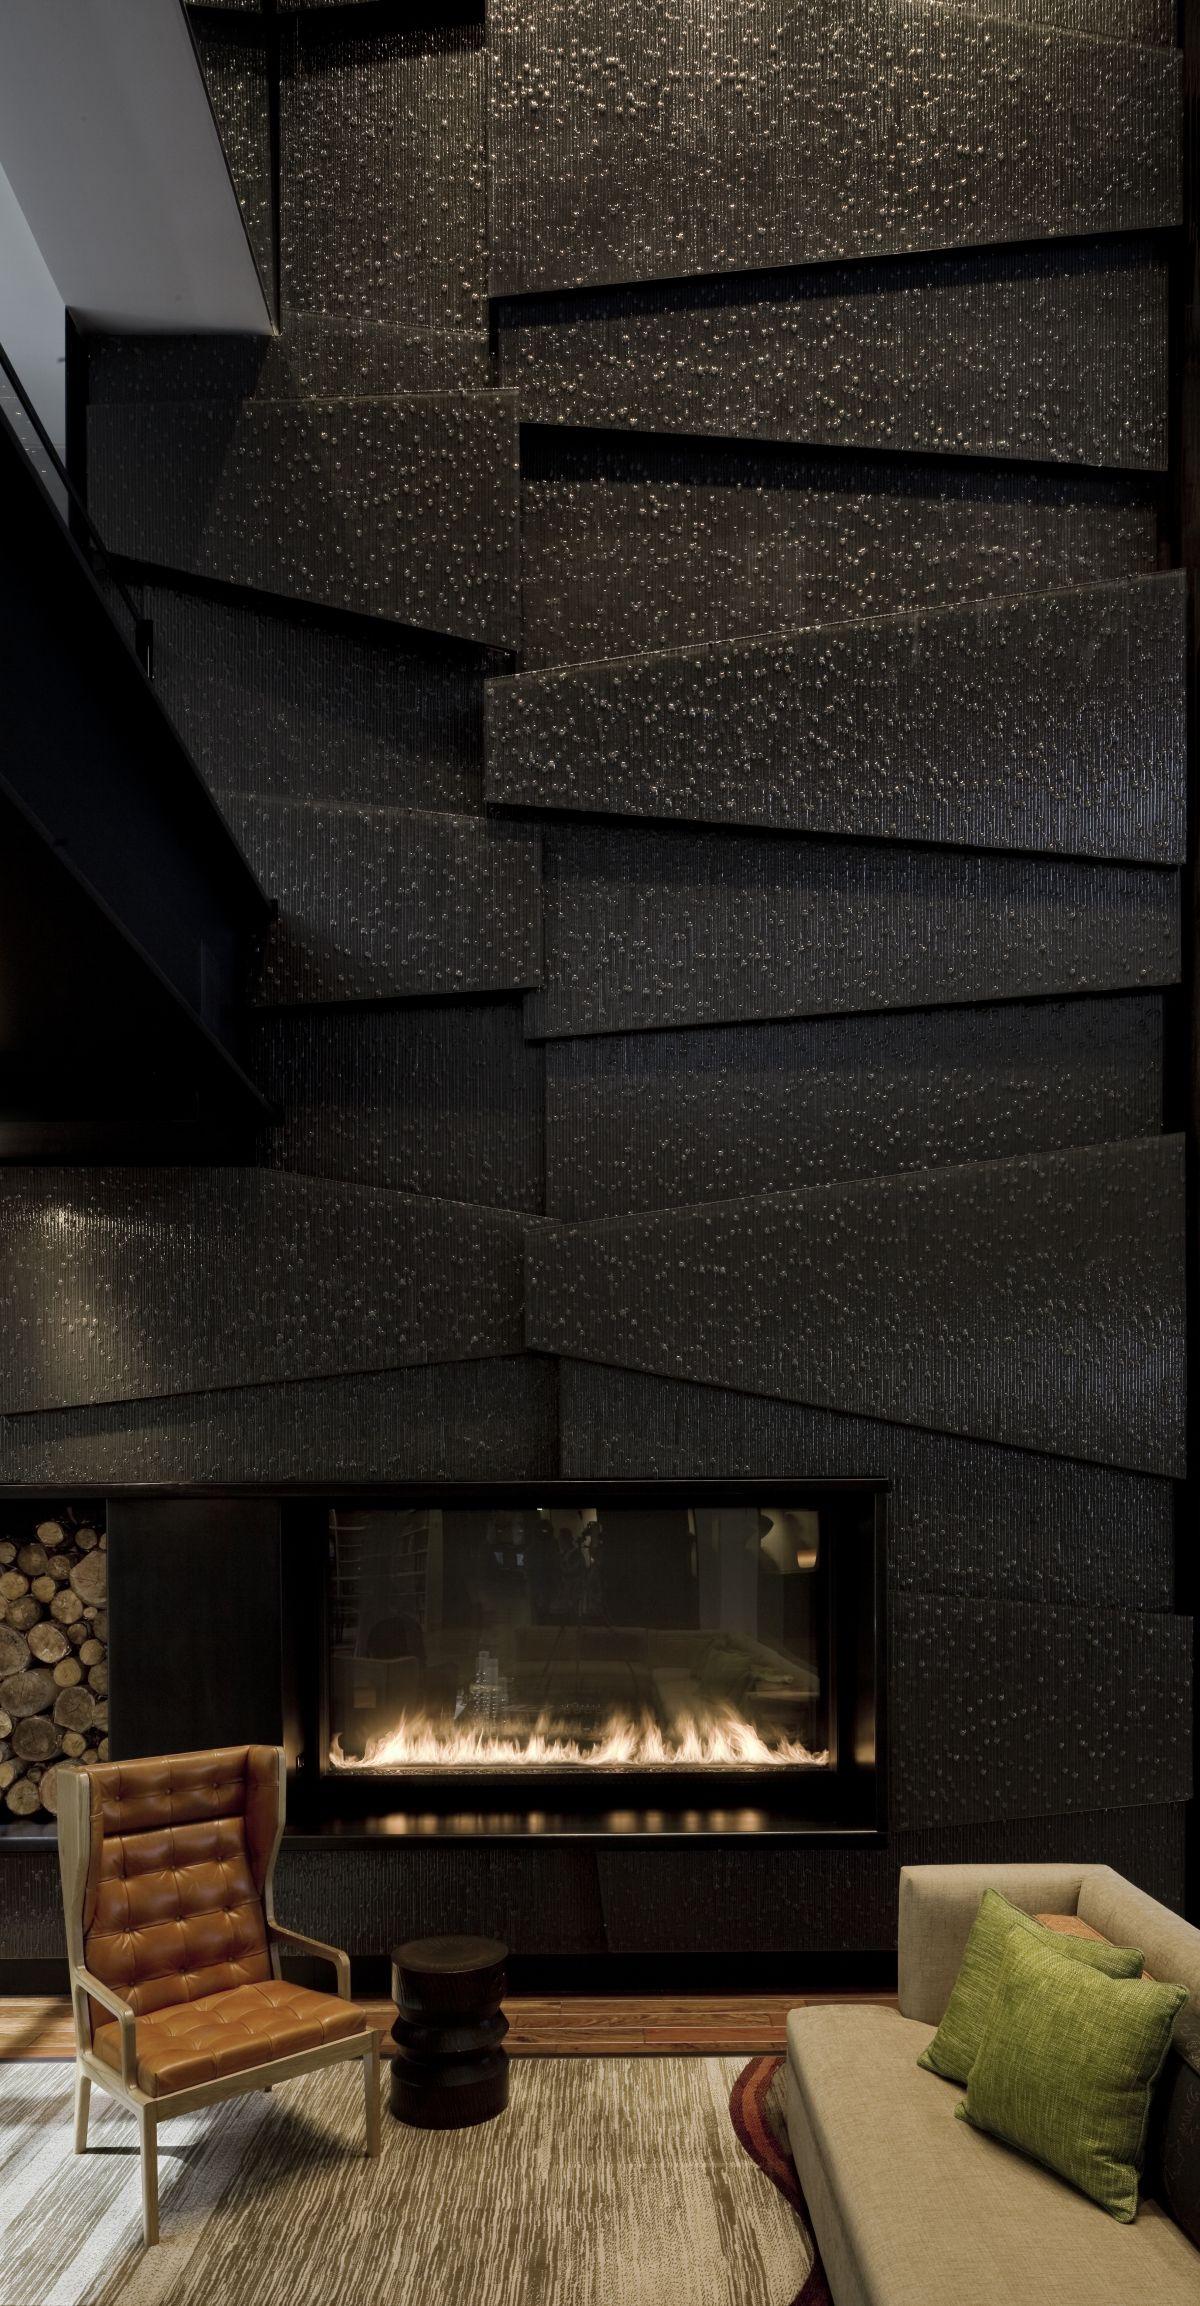 baronette renaissance hotel lobby by d ash design karmatrendz